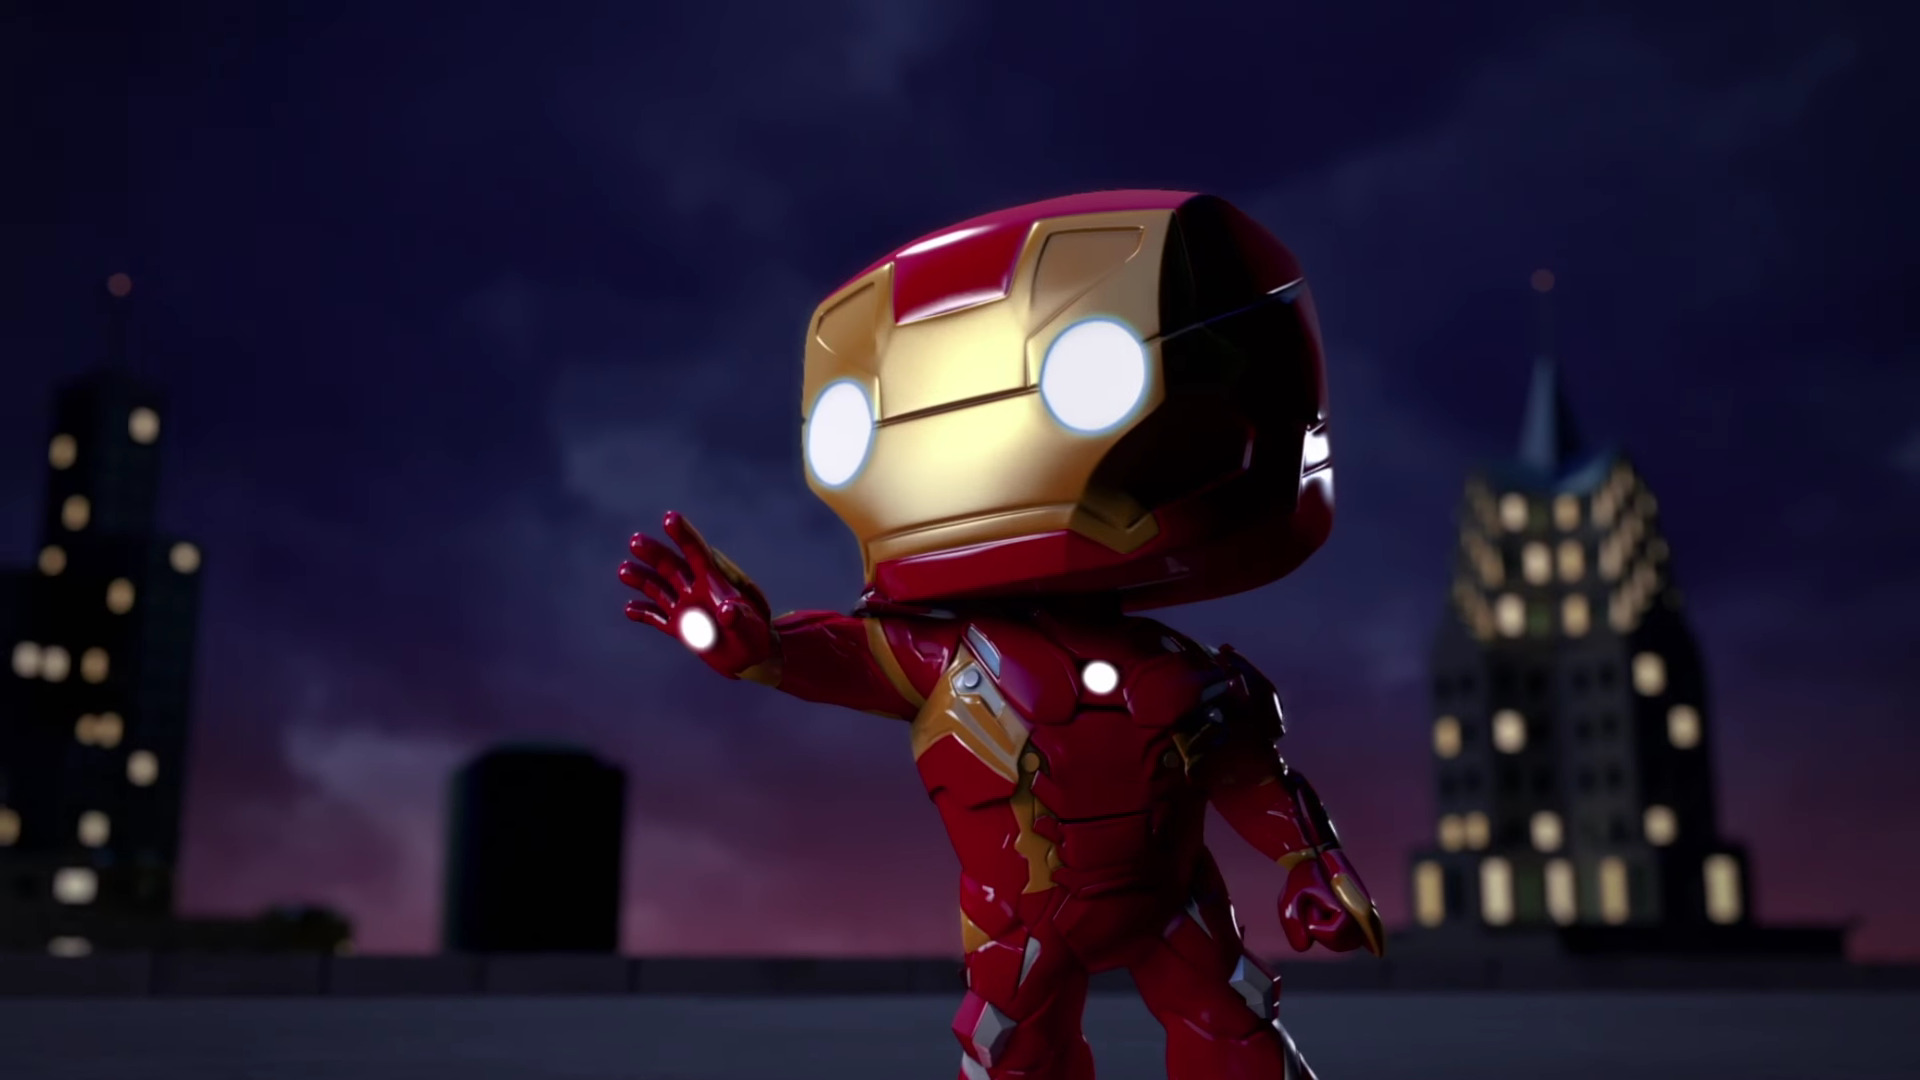 Iron man wallpaper cartoon impre media - Iron man cartoon hd ...